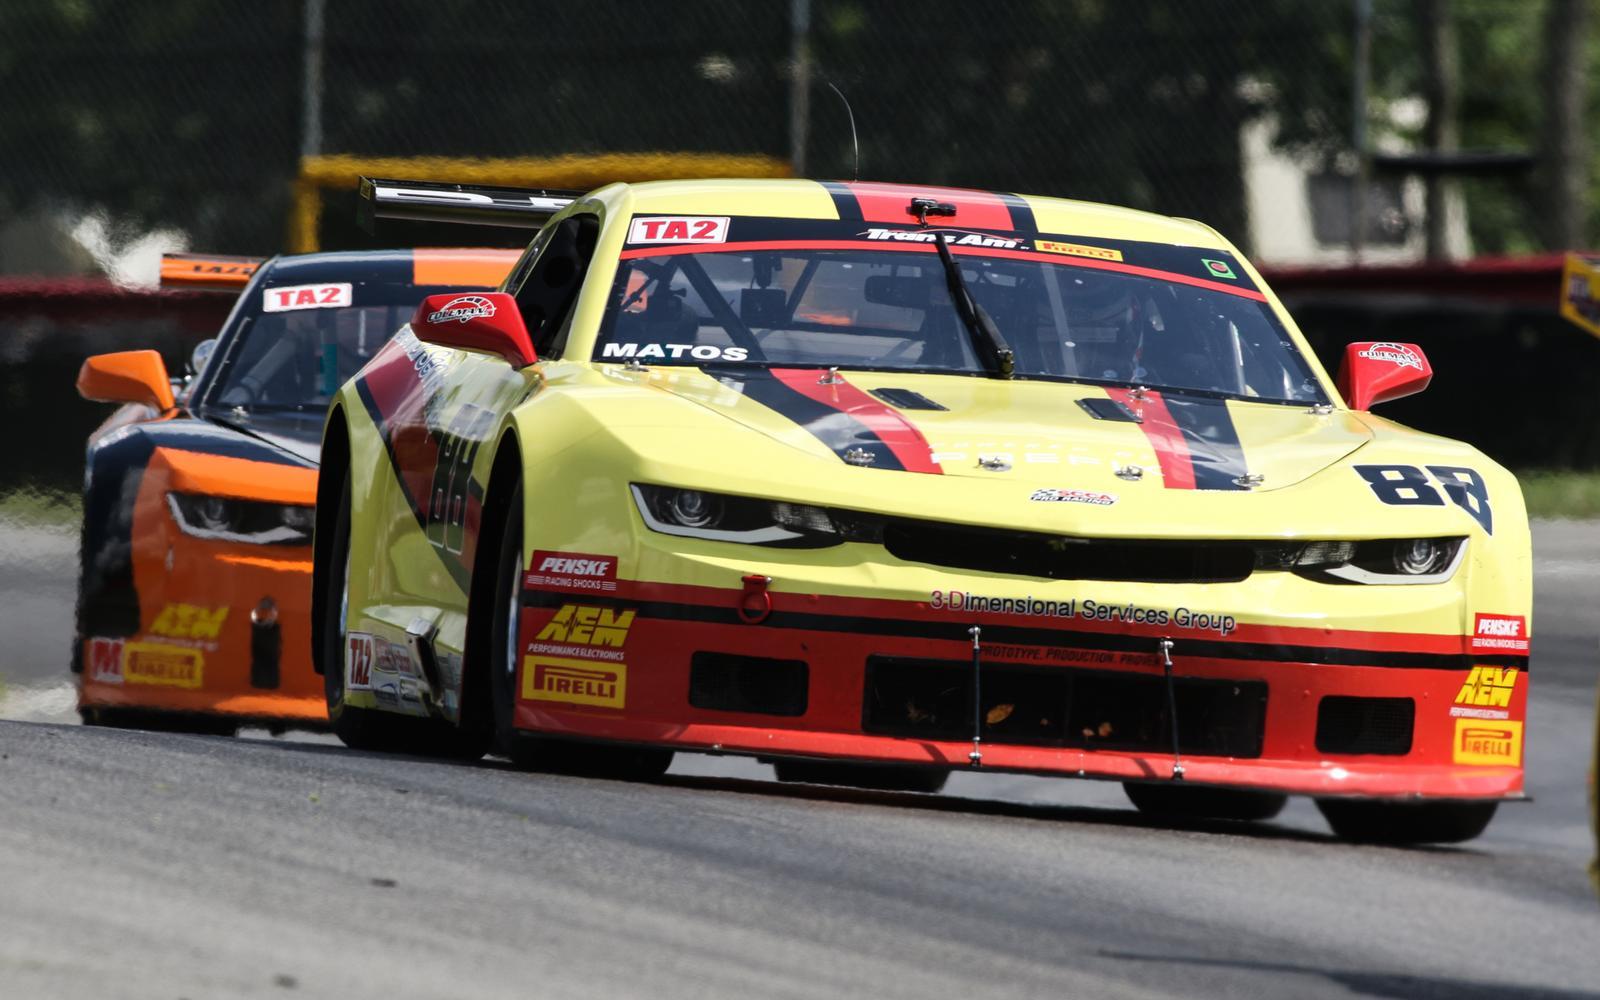 Trans Am - America's Road Racing Series